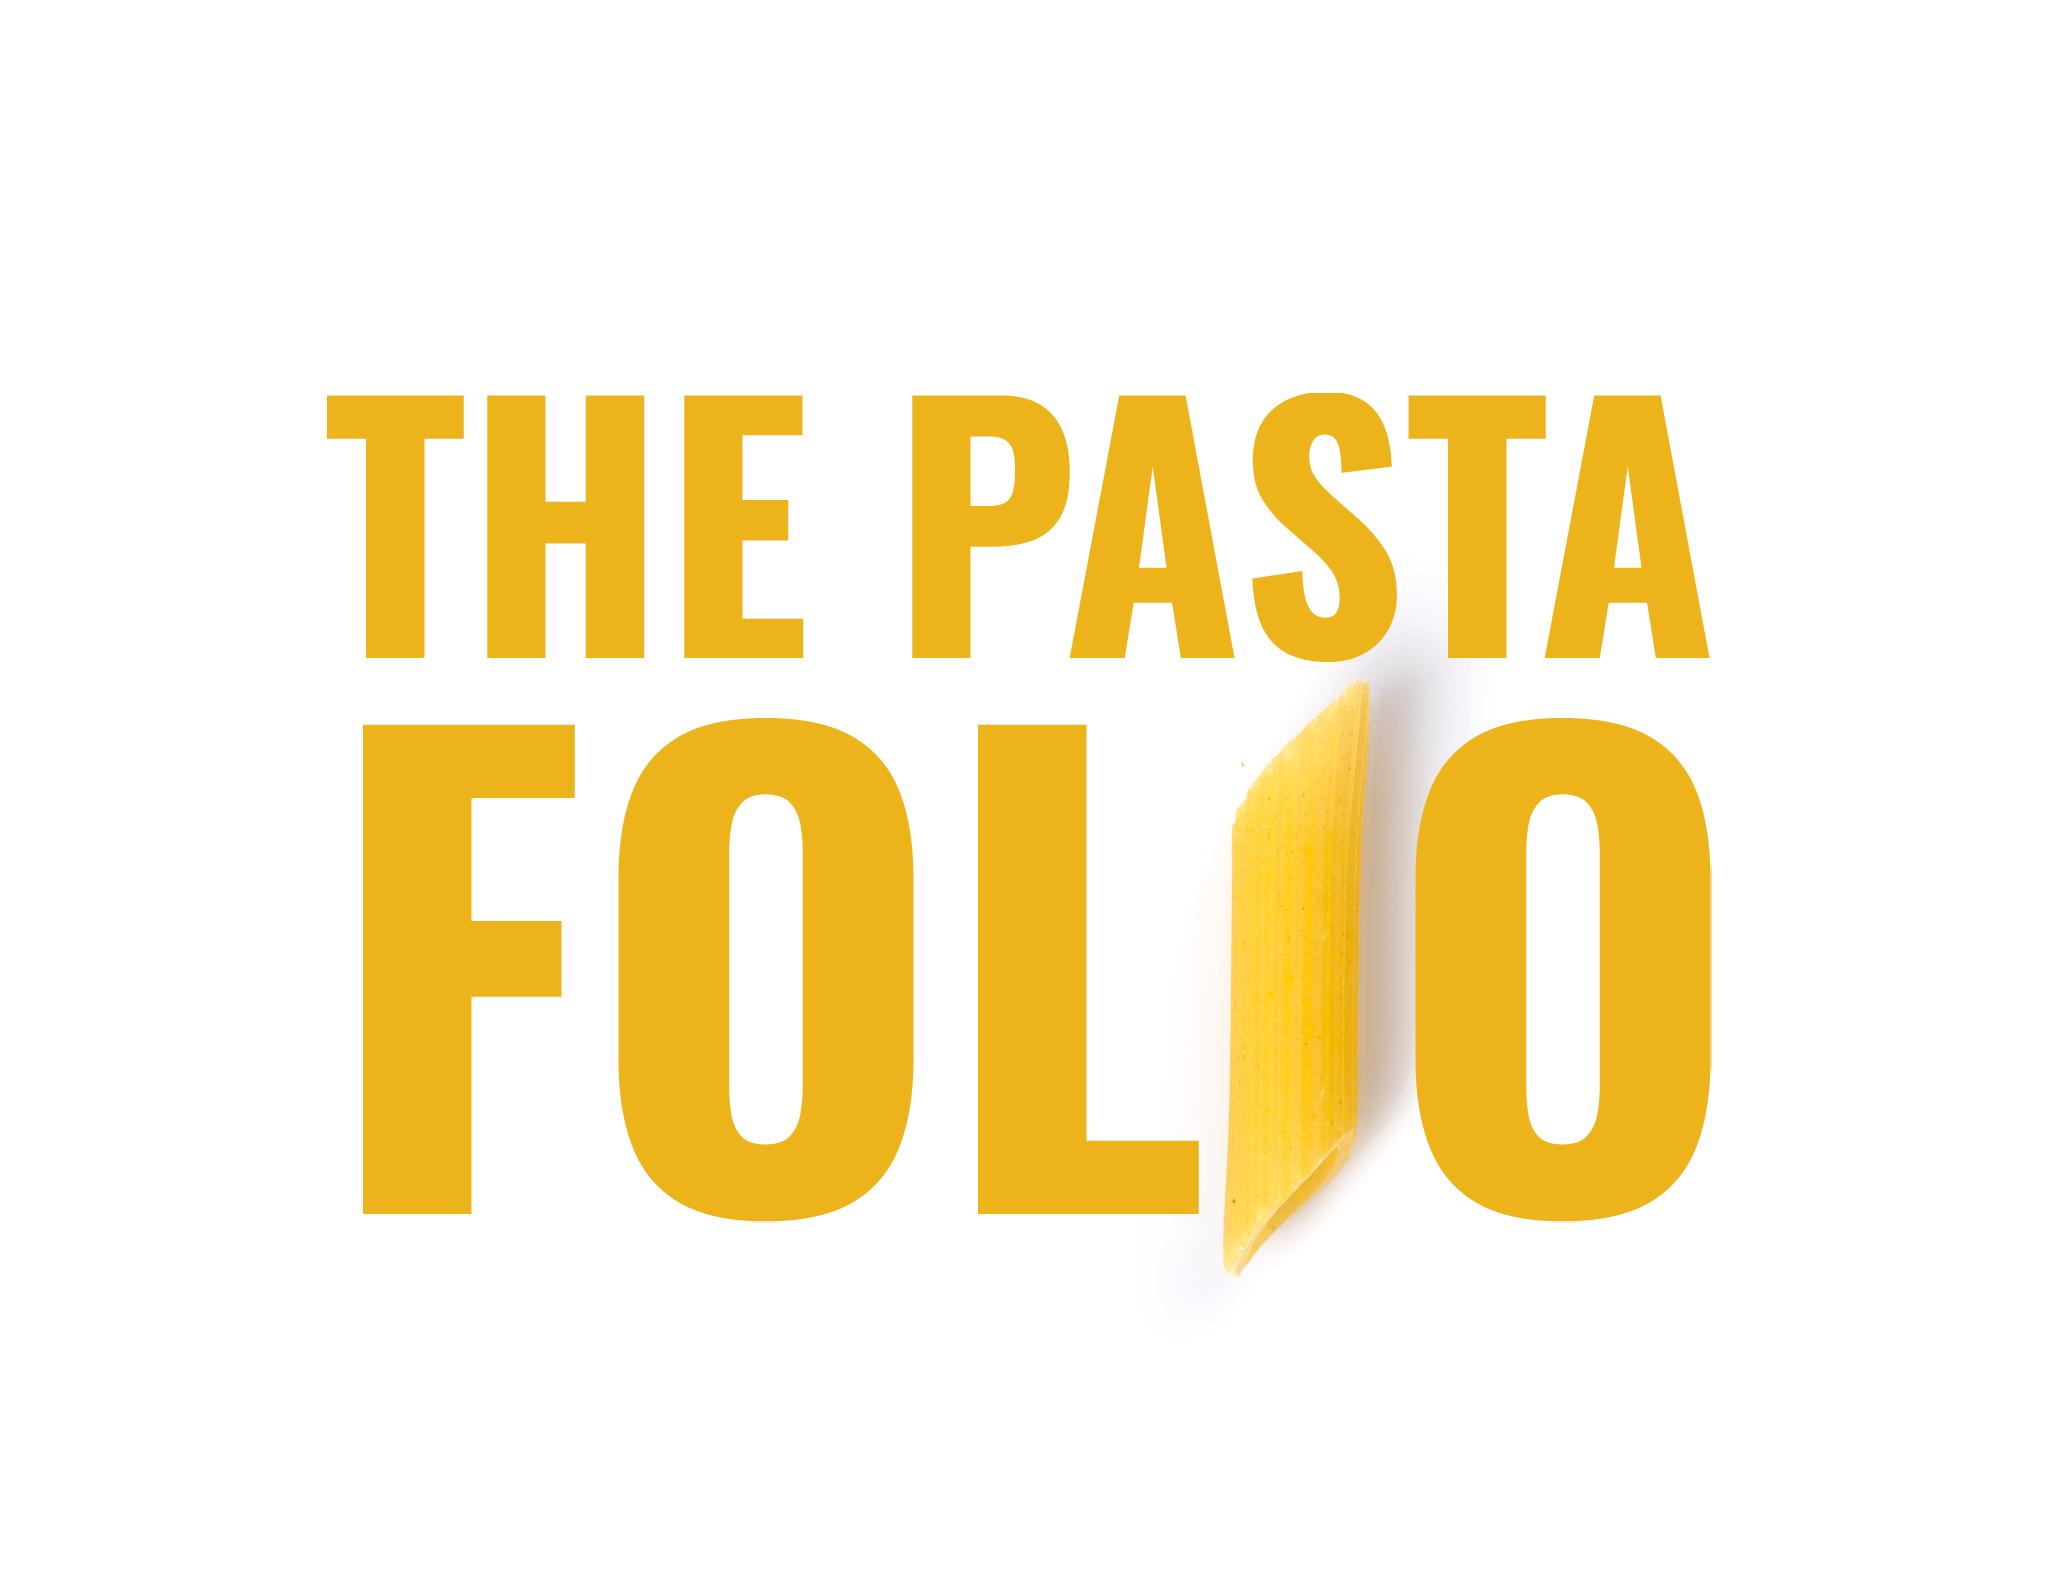 The Pastafolio